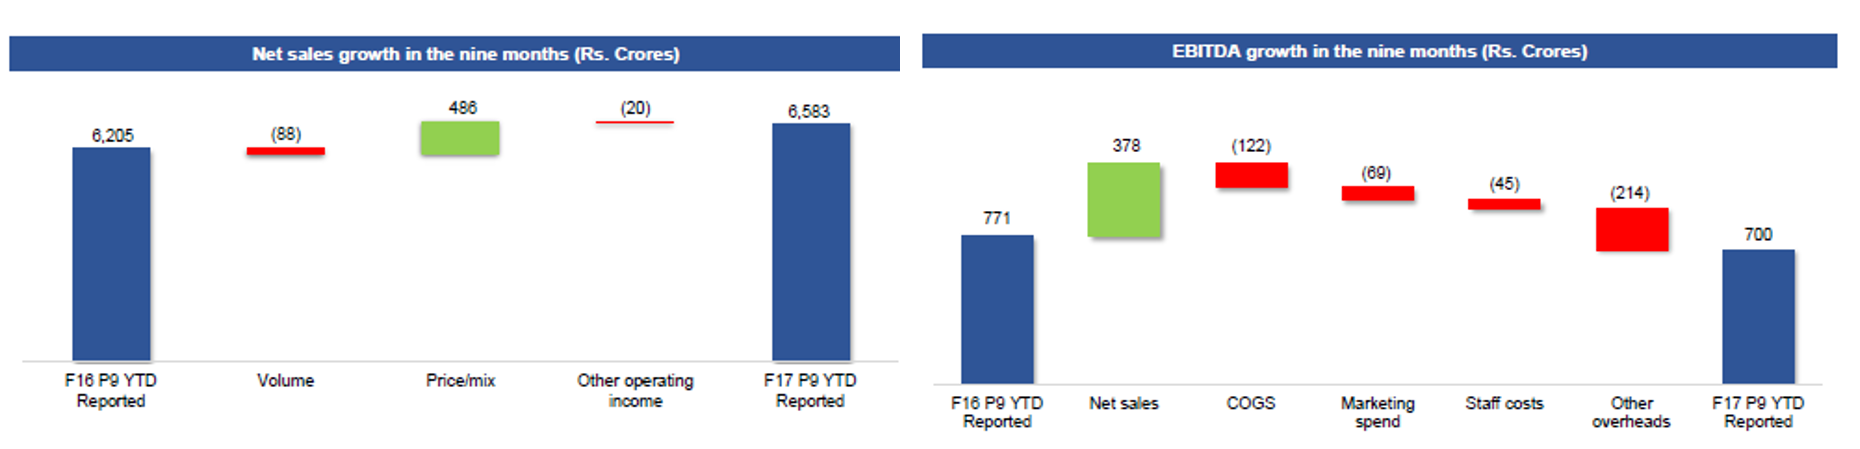 United Spirits Revenue and EBITDA Q3FY17